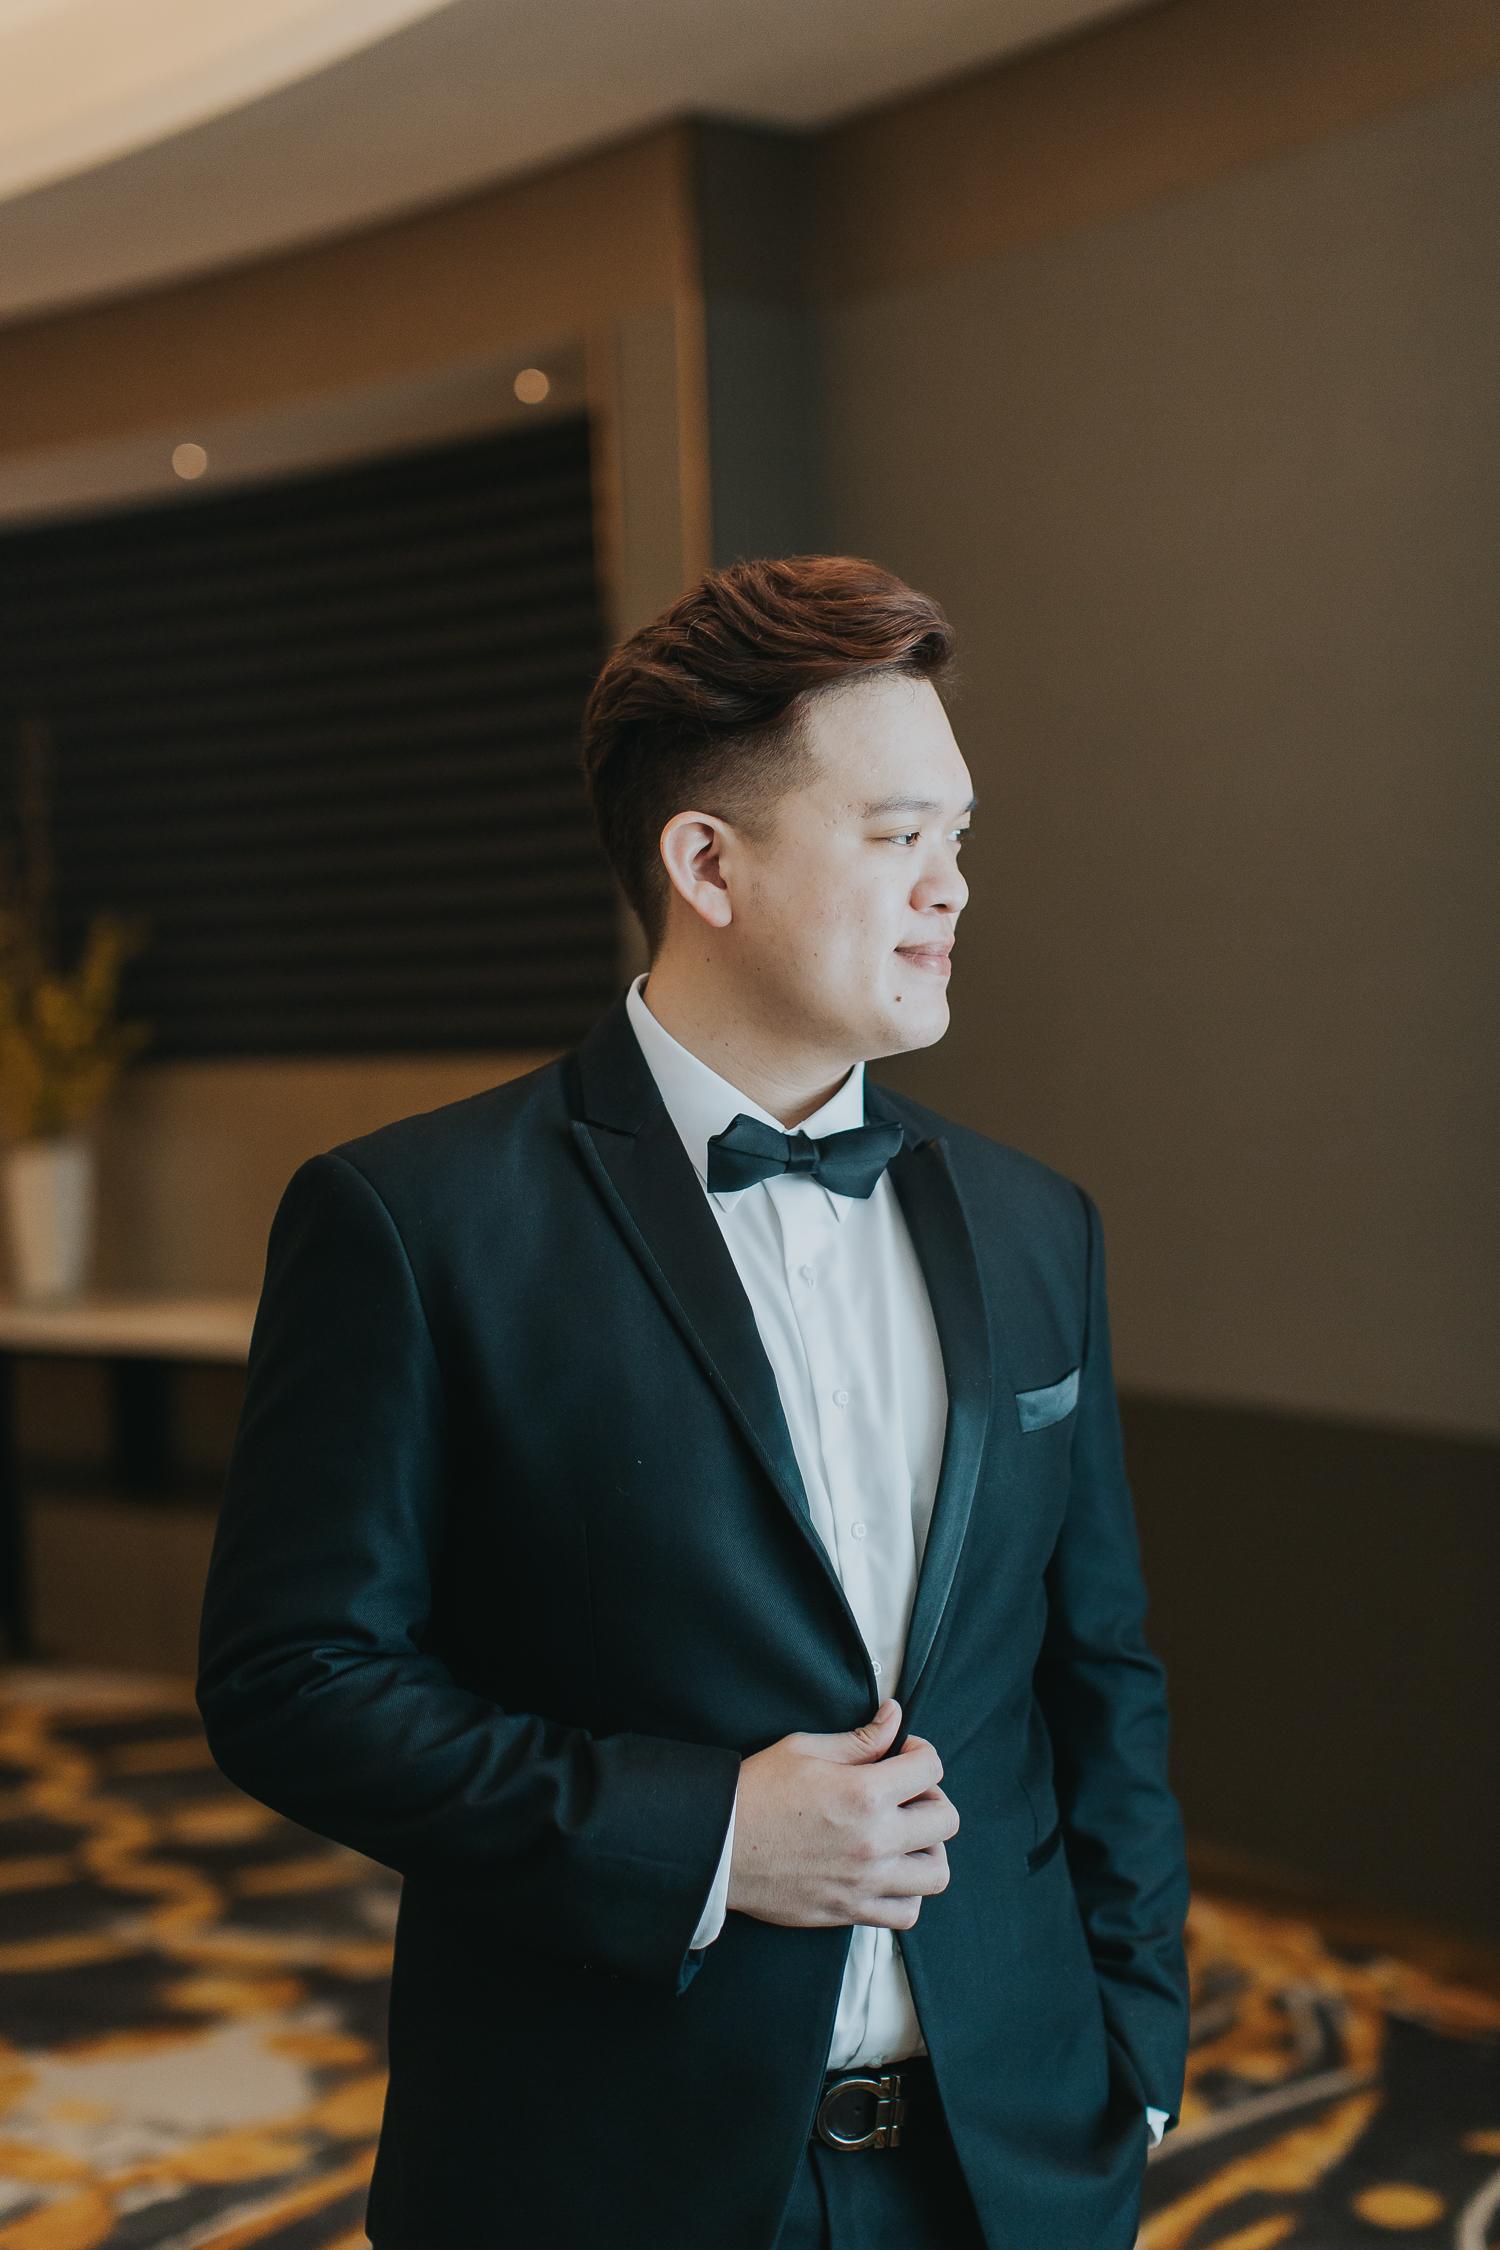 Singapore+Actual+Day+Wedding+Photographer+Grand+Mercure+Oliver+Estelle-0081.jpg